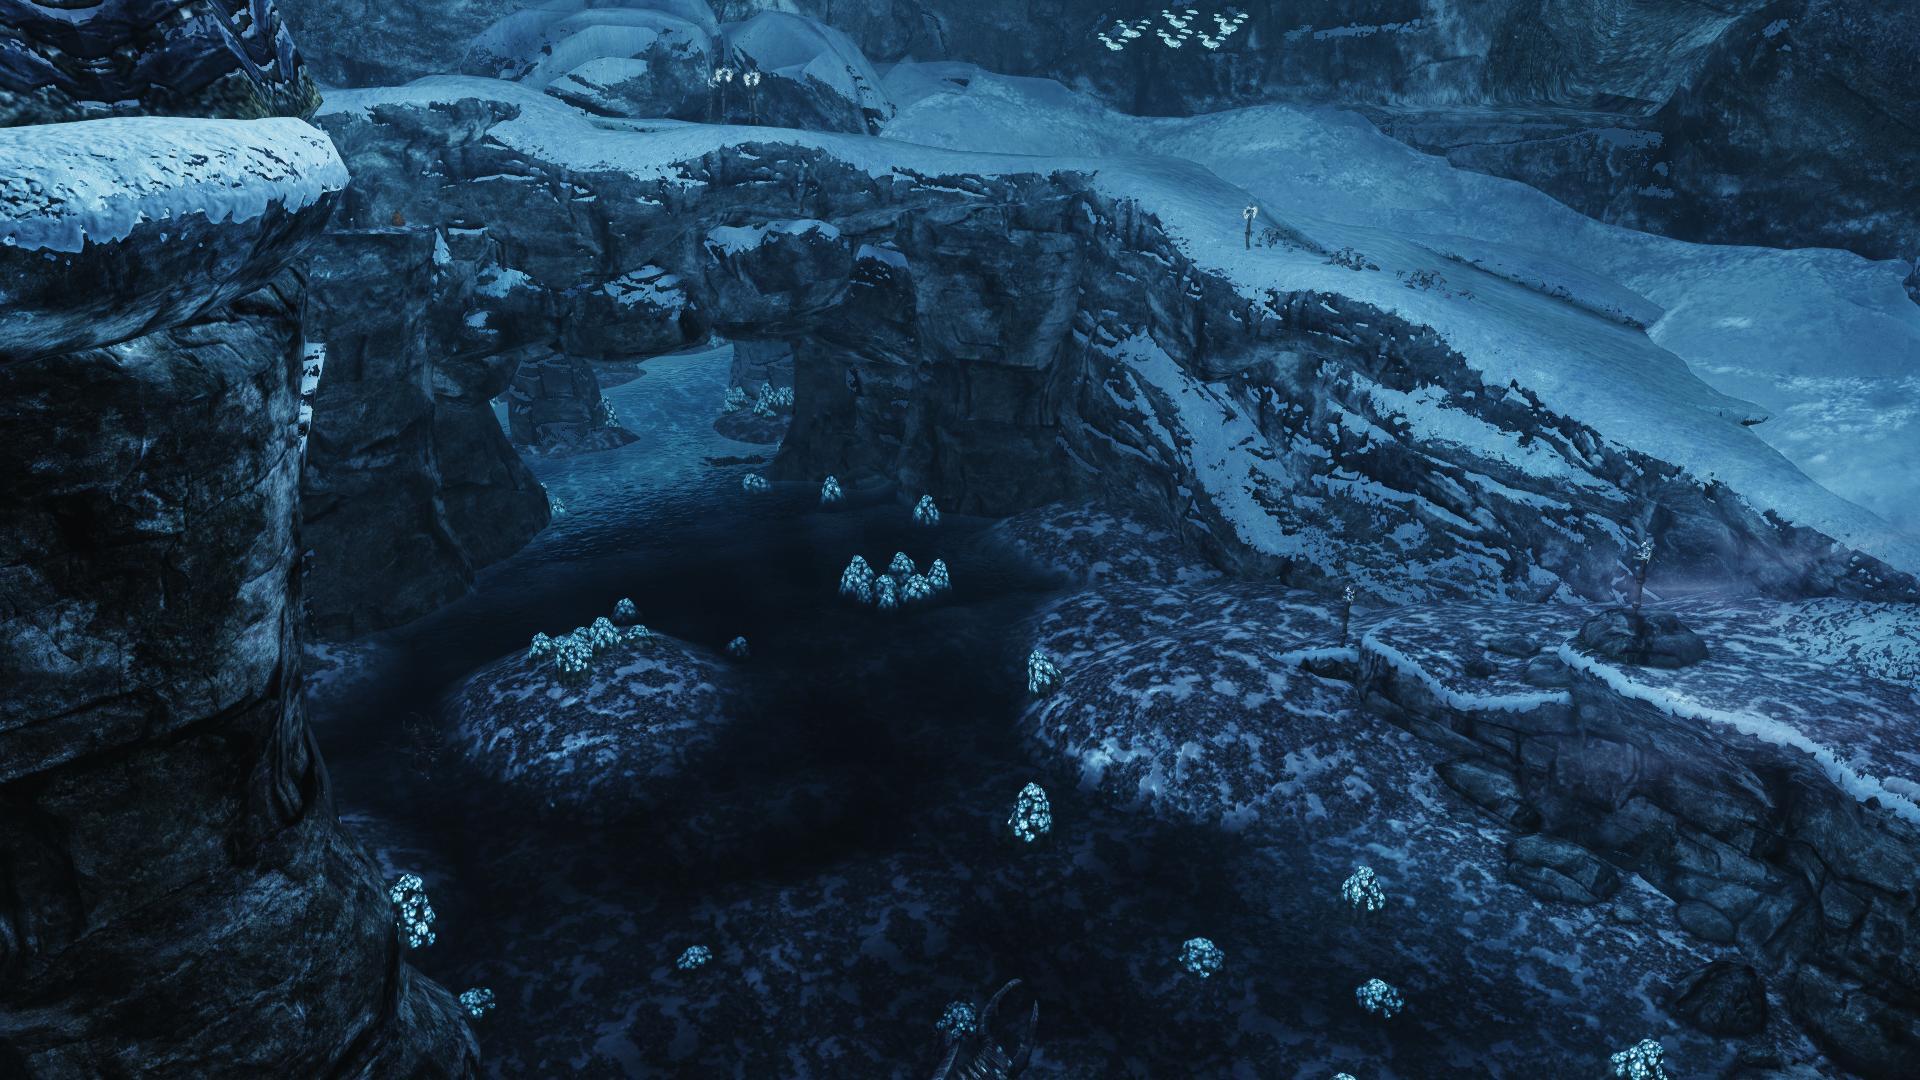 000786.Jpg - Elder Scrolls 5: Skyrim, the